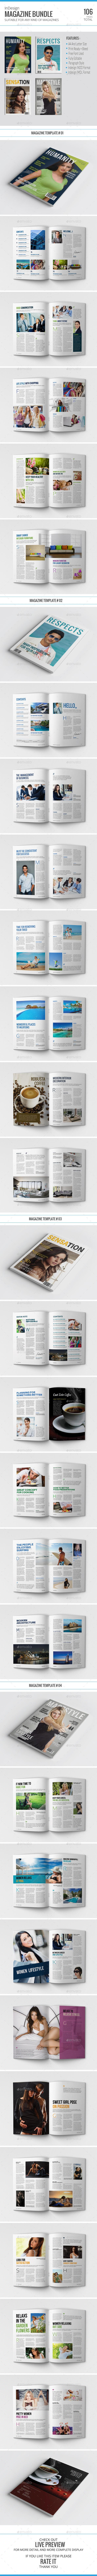 GraphicRiver Magazine Bundle Vol 02 10054129